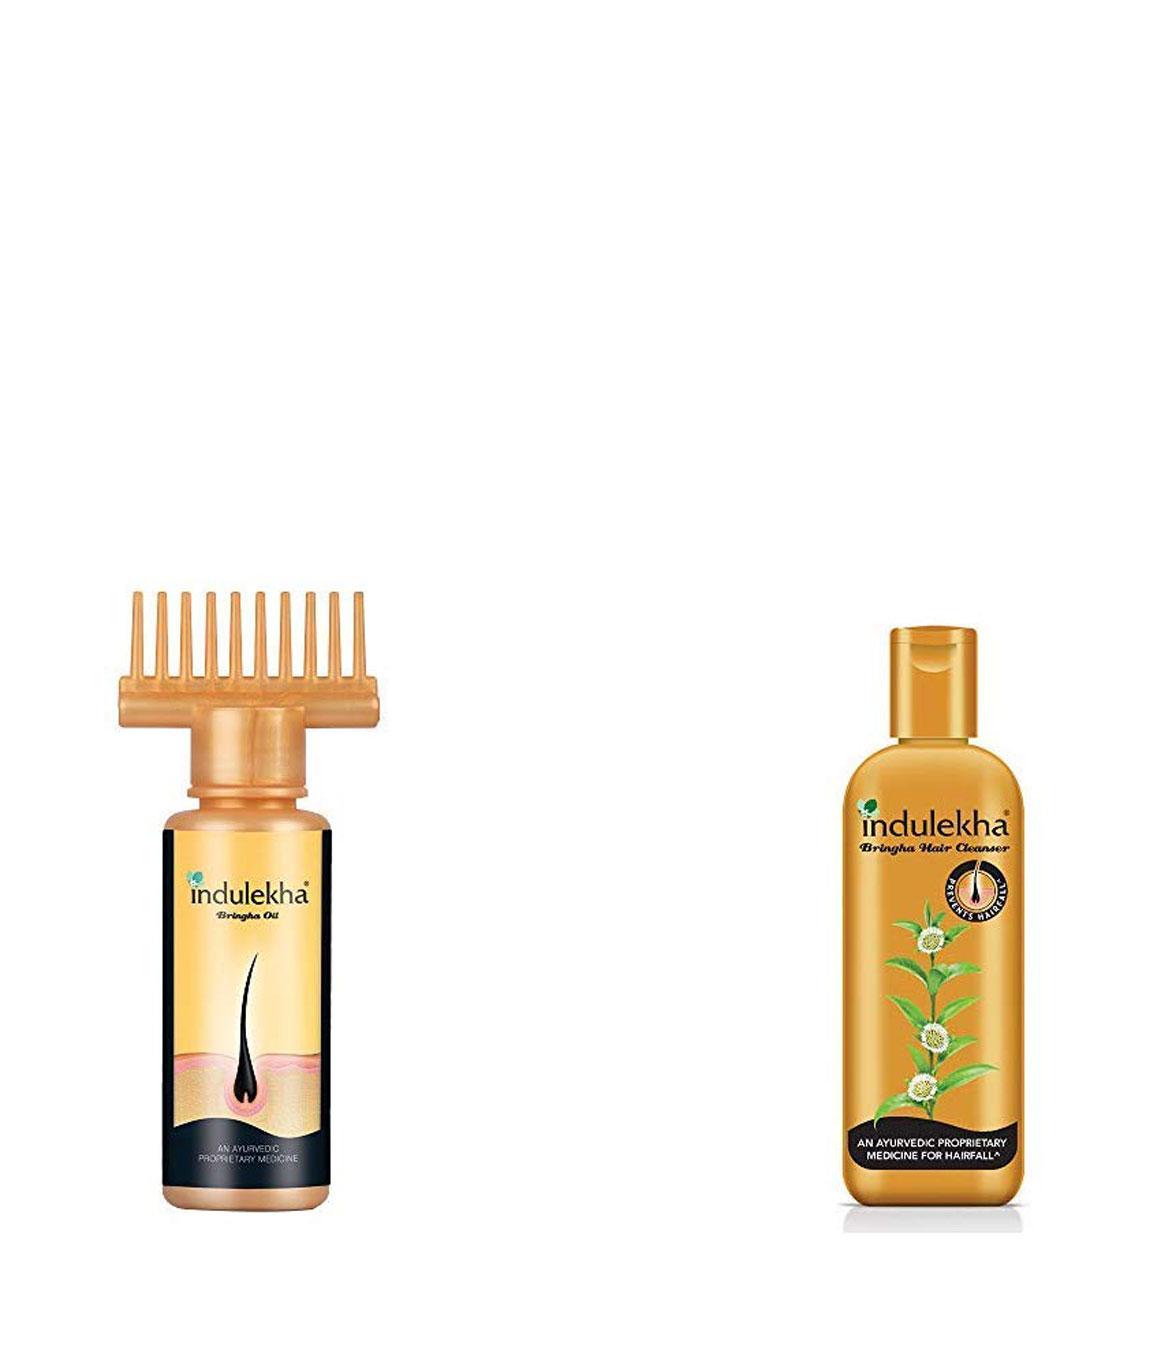 Indulekha Bhringa Hair Oil, 50ml & Indulekha Bringha Hair Anti-Hair Fall Shampoo, 100ml